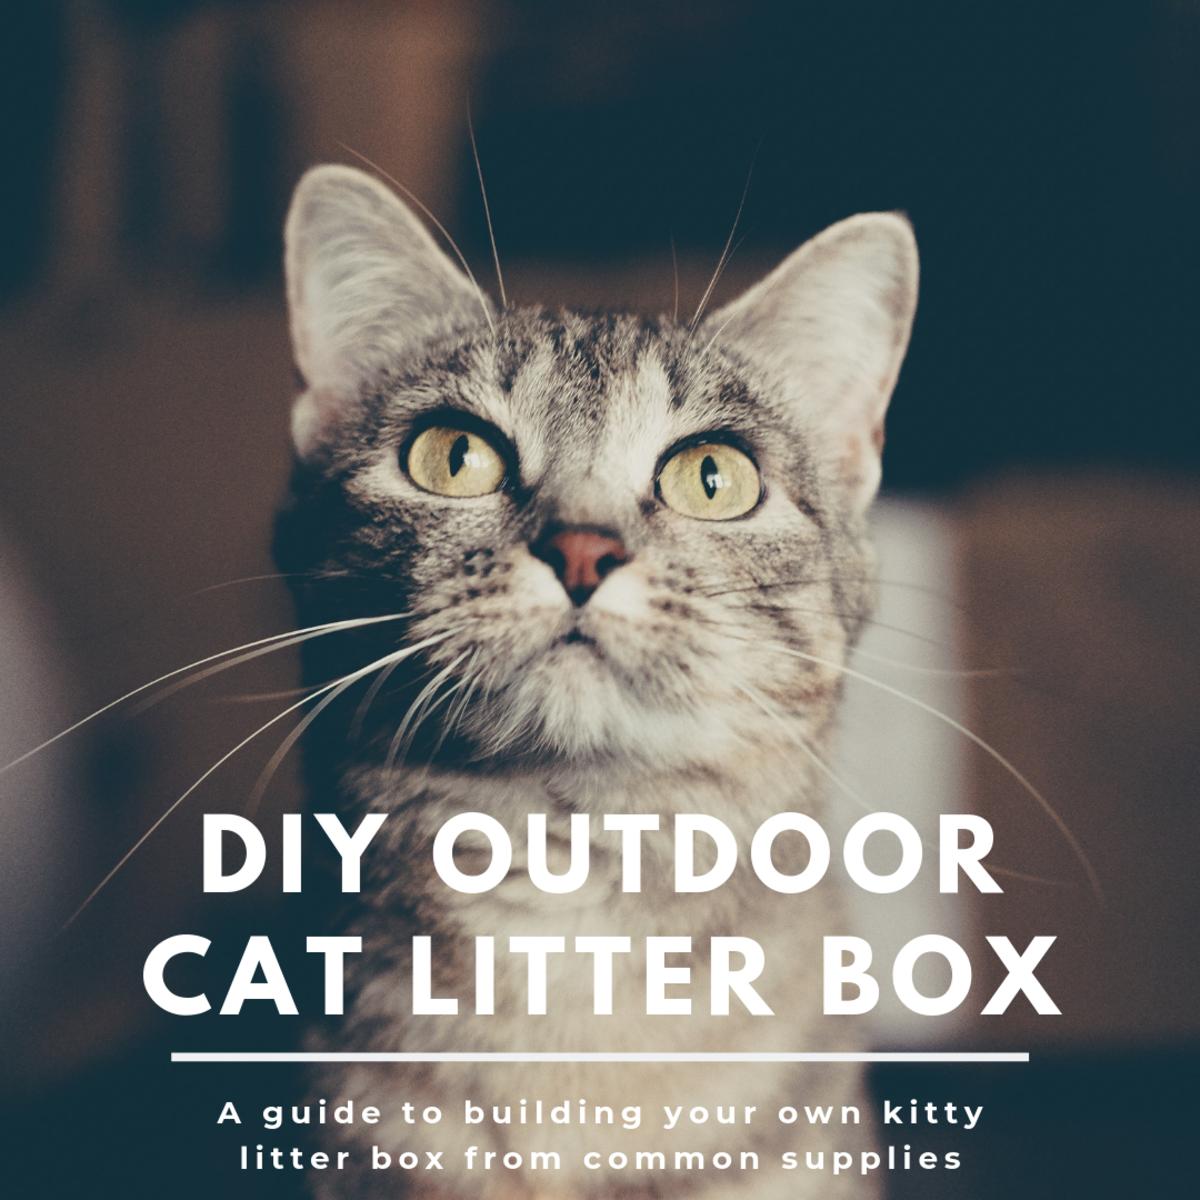 How to Build an Outdoor Cat Litter Box